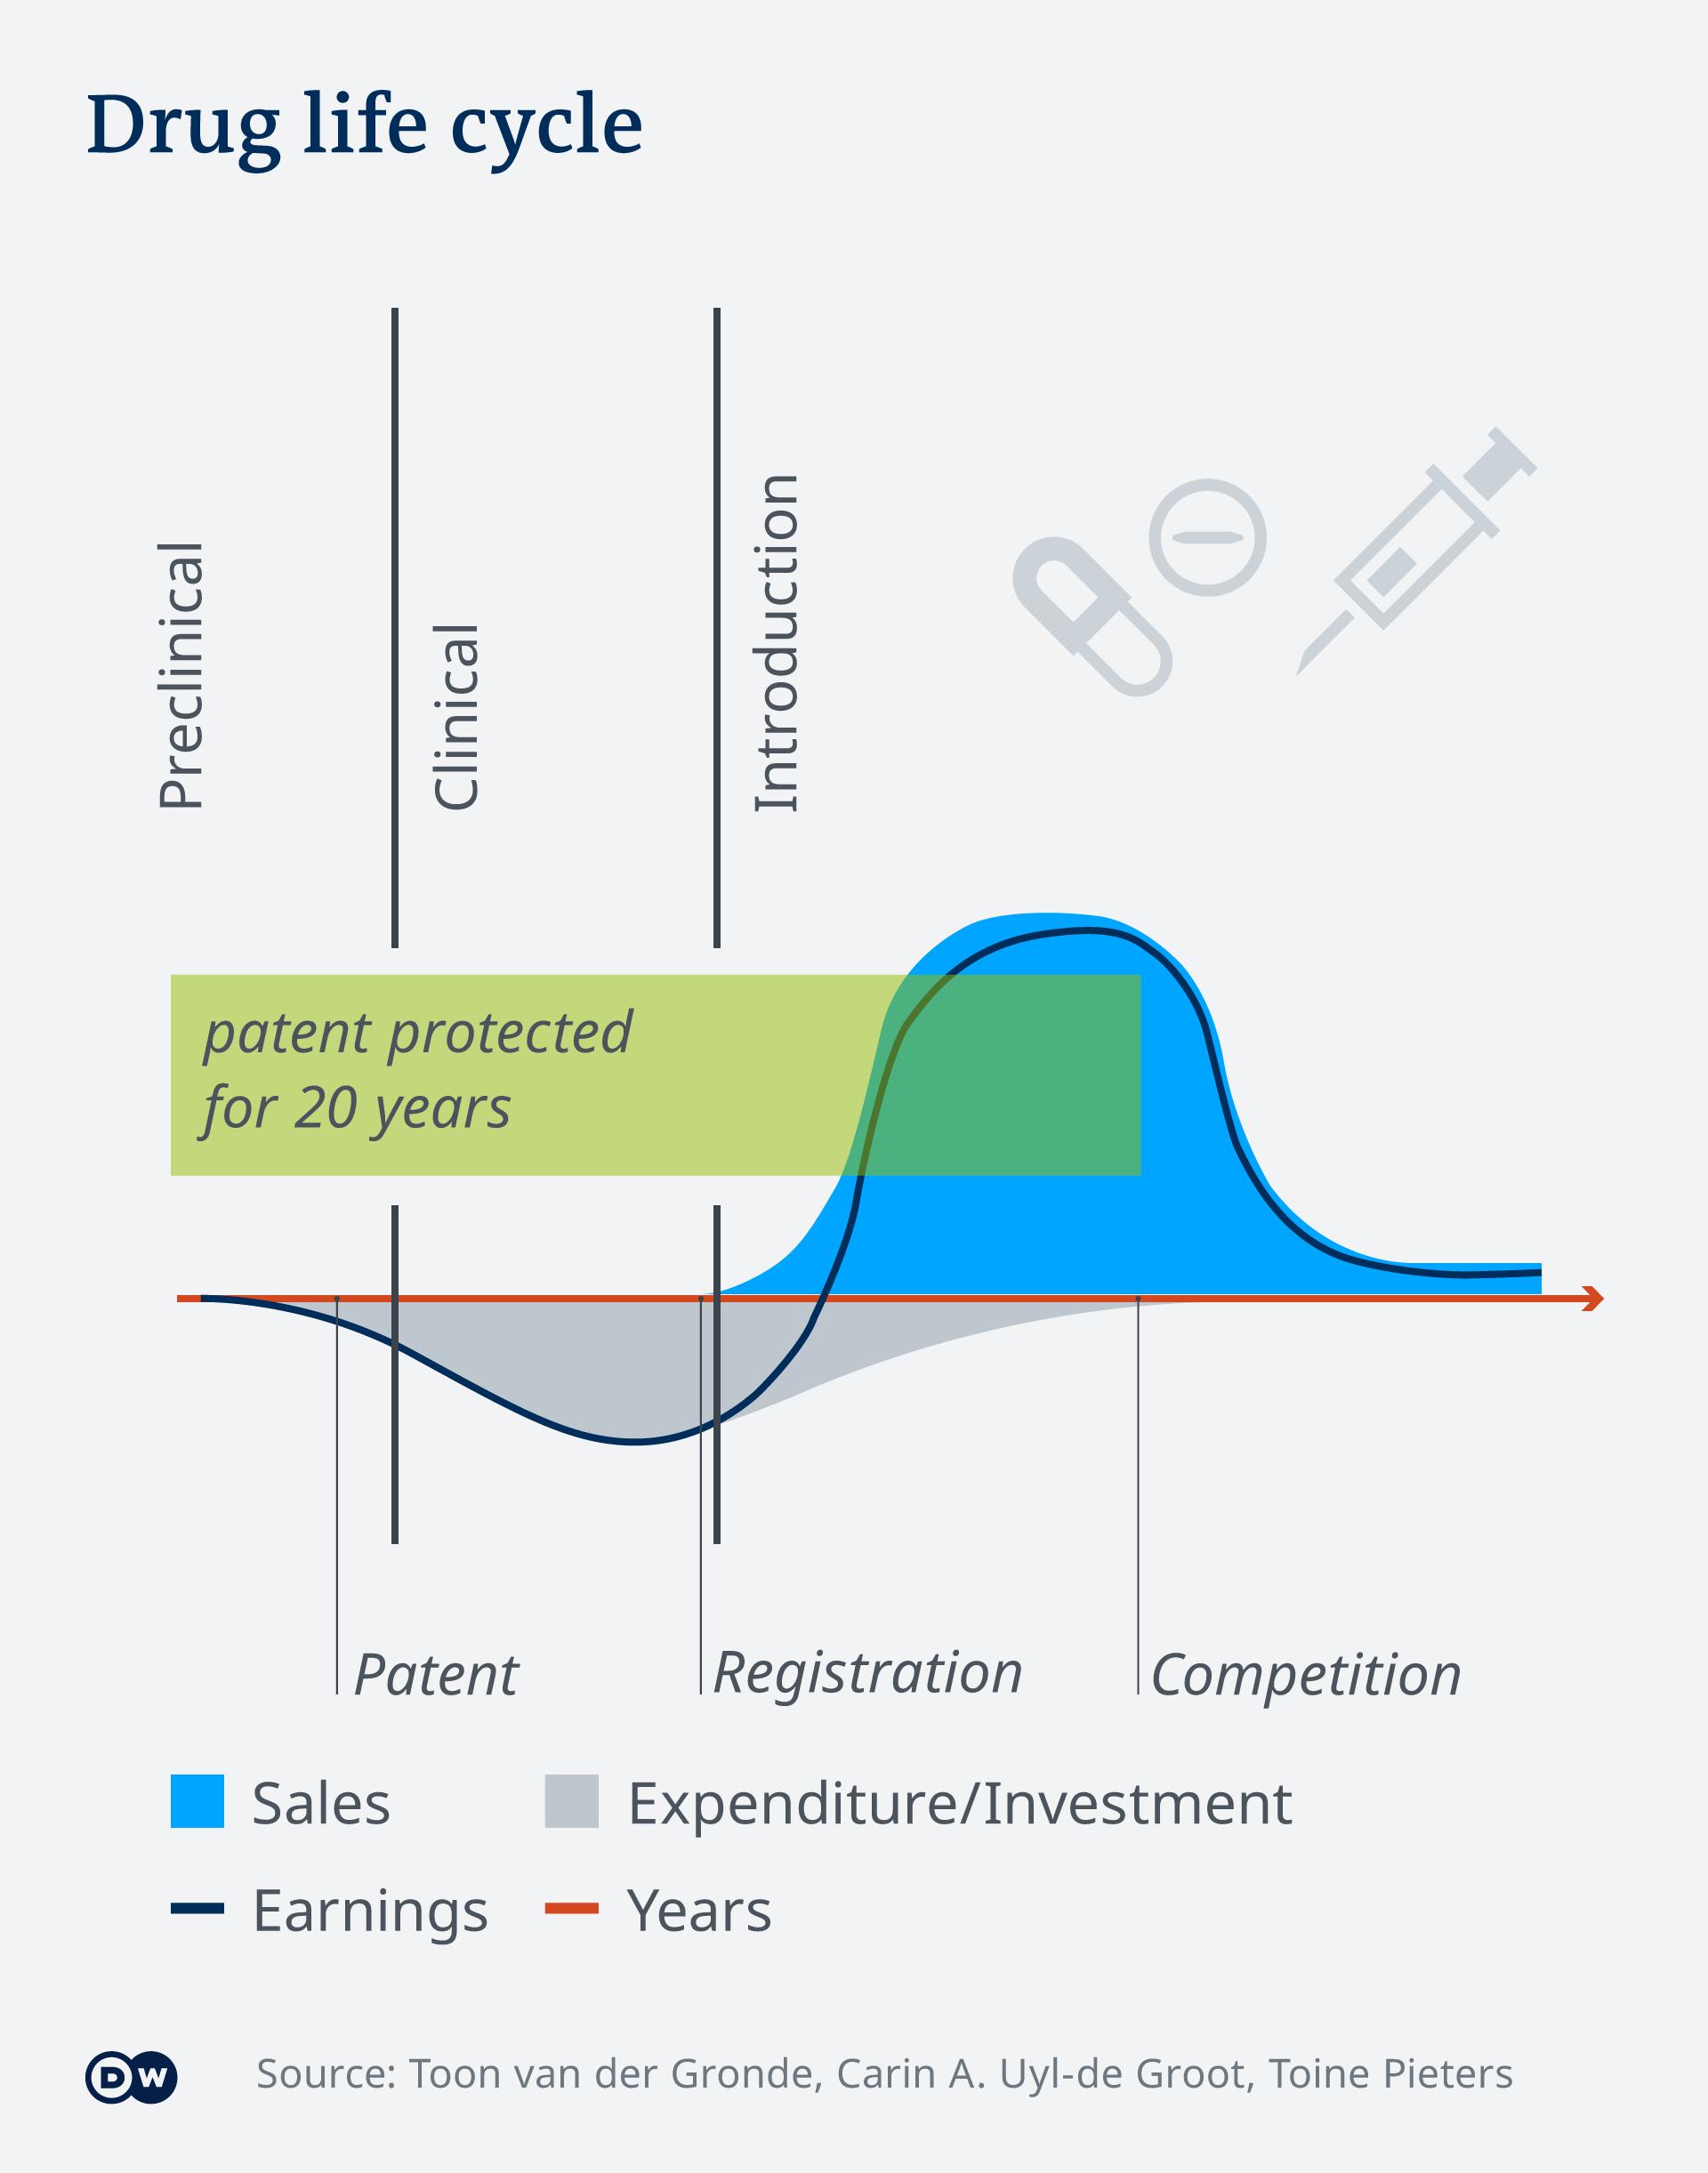 Graphic: Drug life cycle